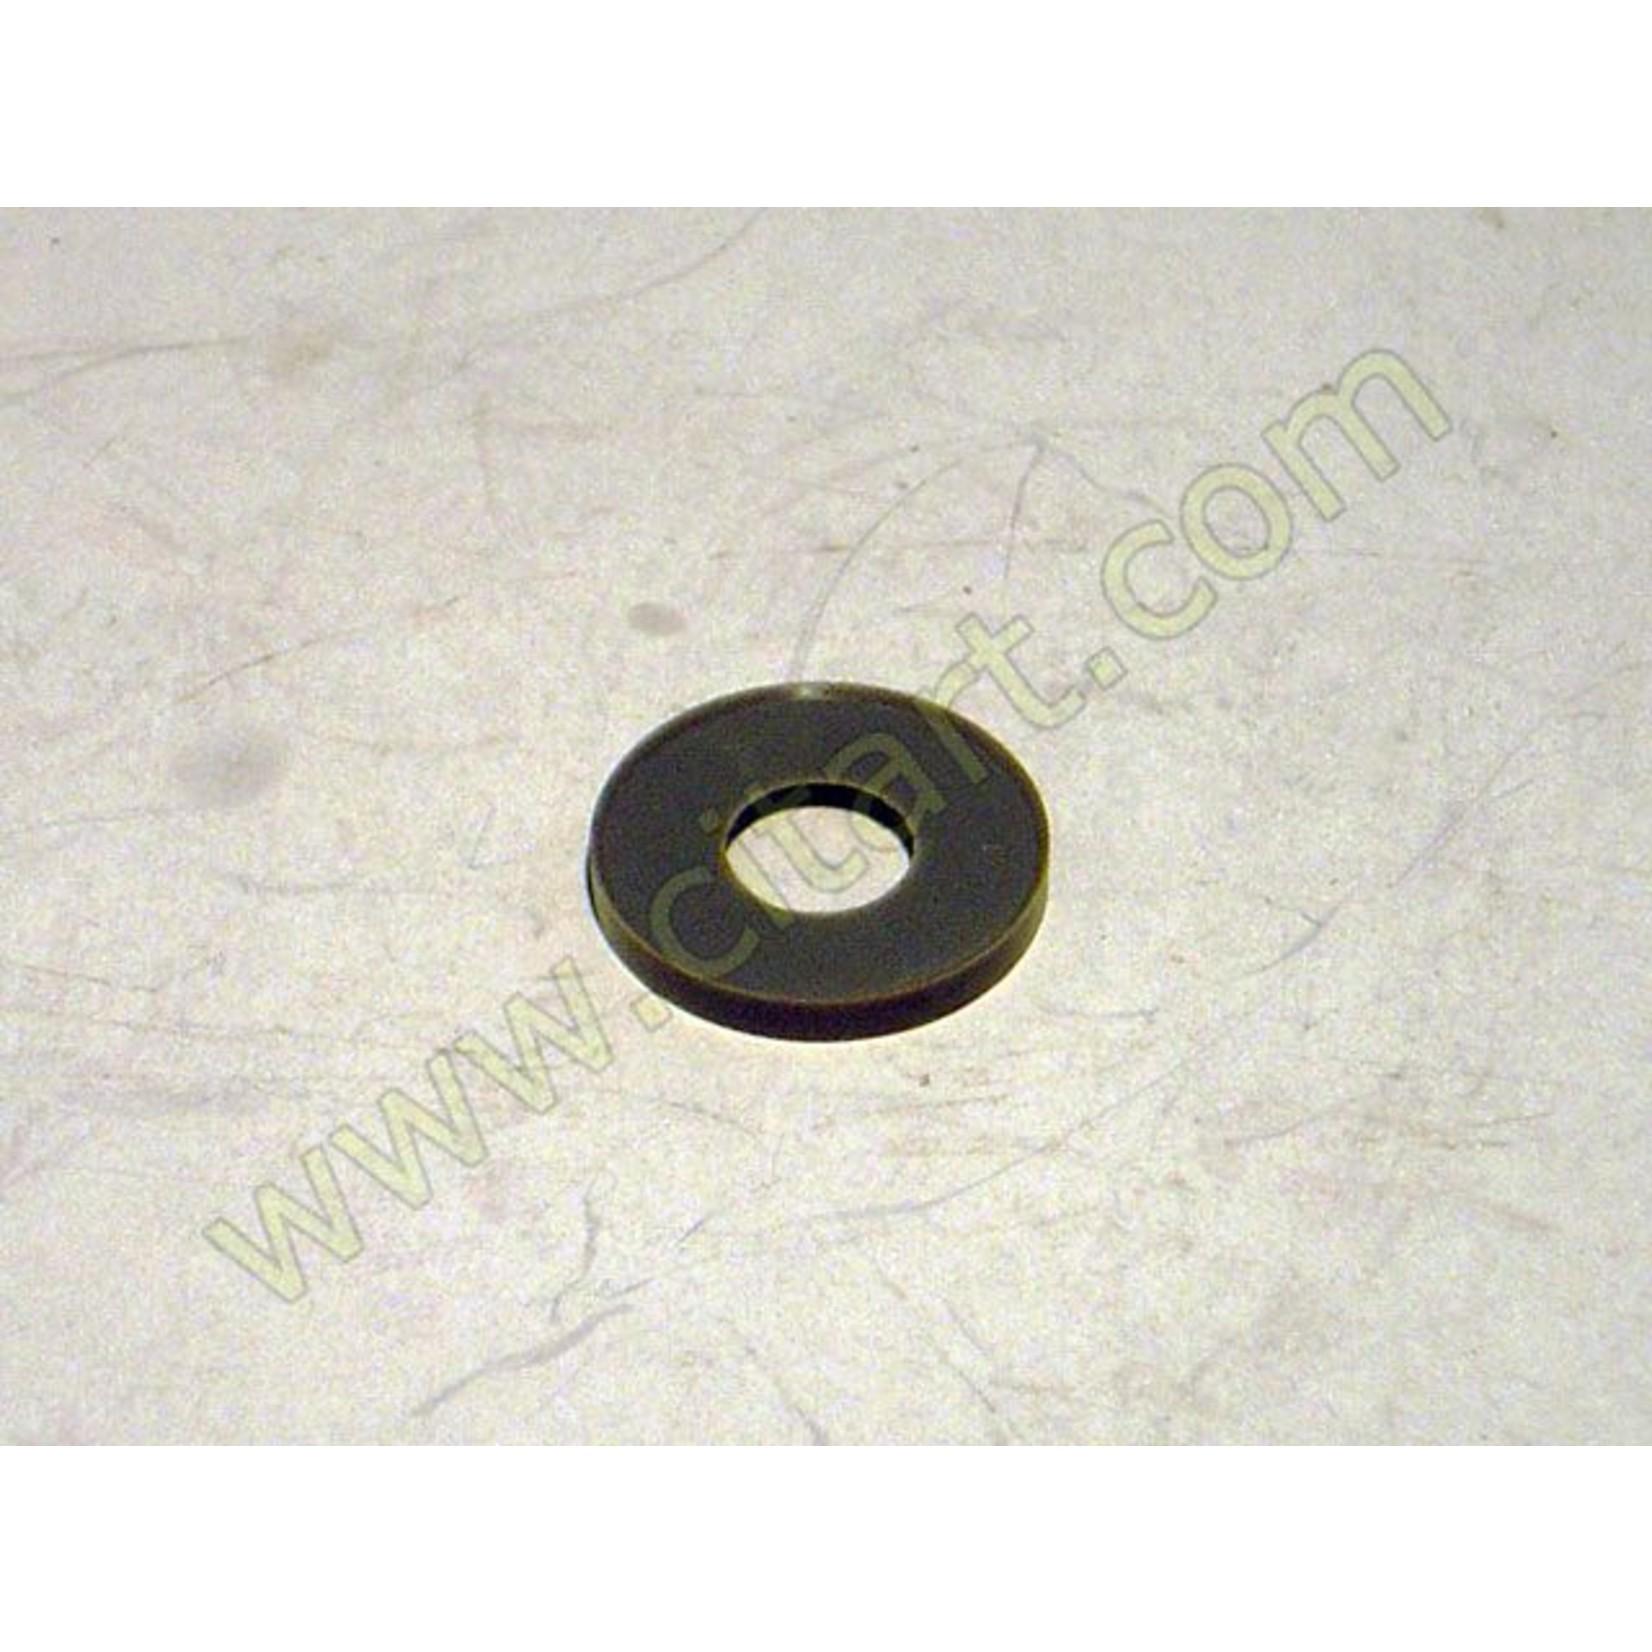 Rondelle nylon de fixation Nr Org: DX8517193